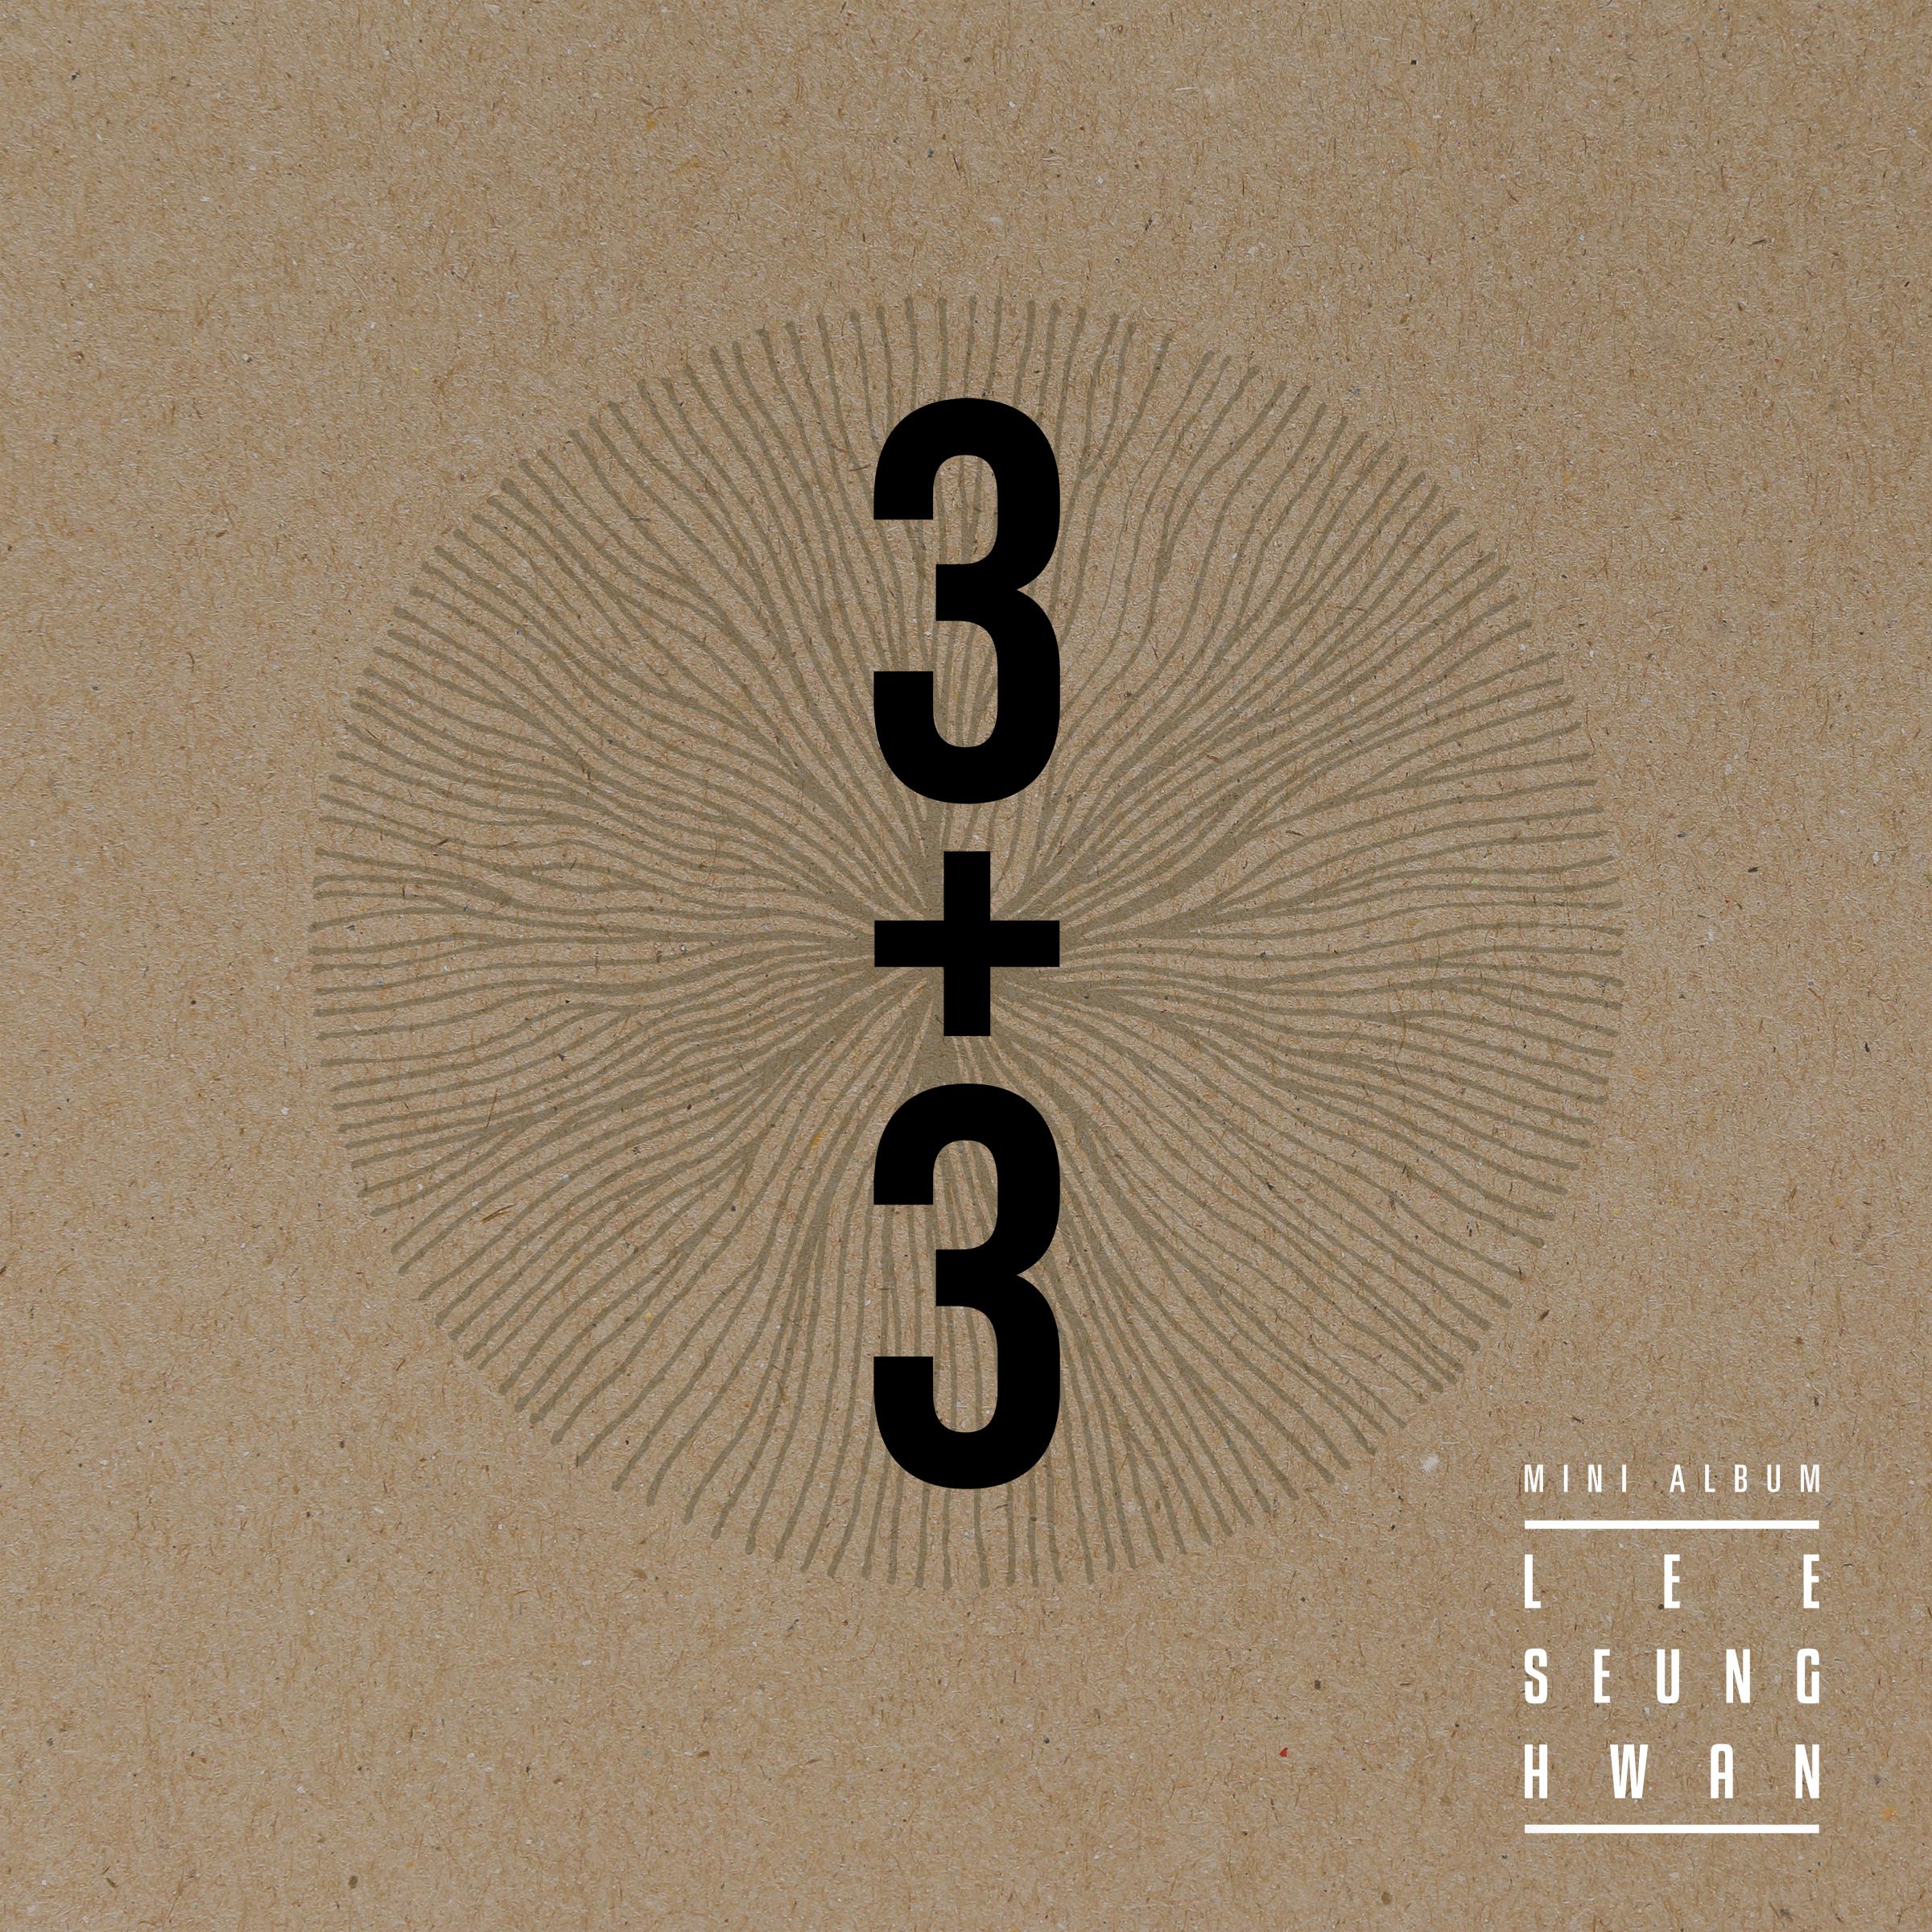 Lee Seung Hwan - 3+3 (Full Mini Album) K2Ost free mp3 download korean song kpop kdrama ost lyric 320 kbps